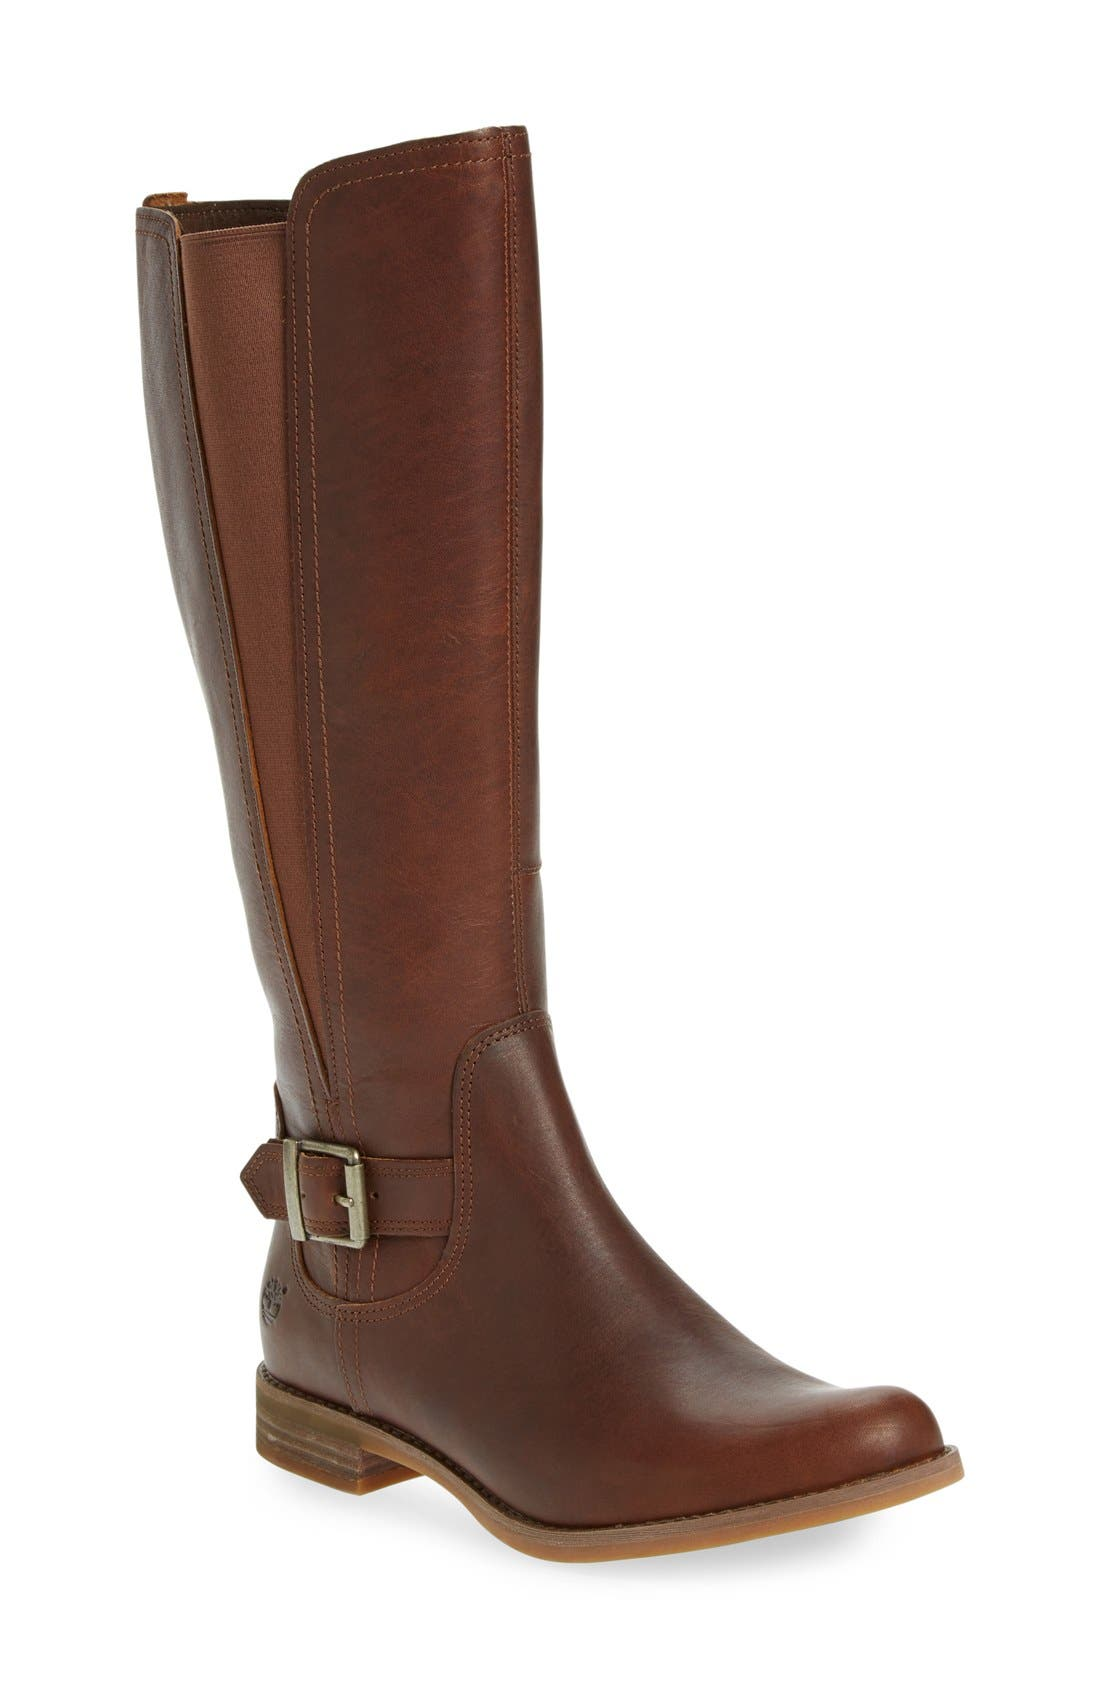 Alternate Image 1 Selected - Timberland 'Savin Hill' Tall Boot (Women)